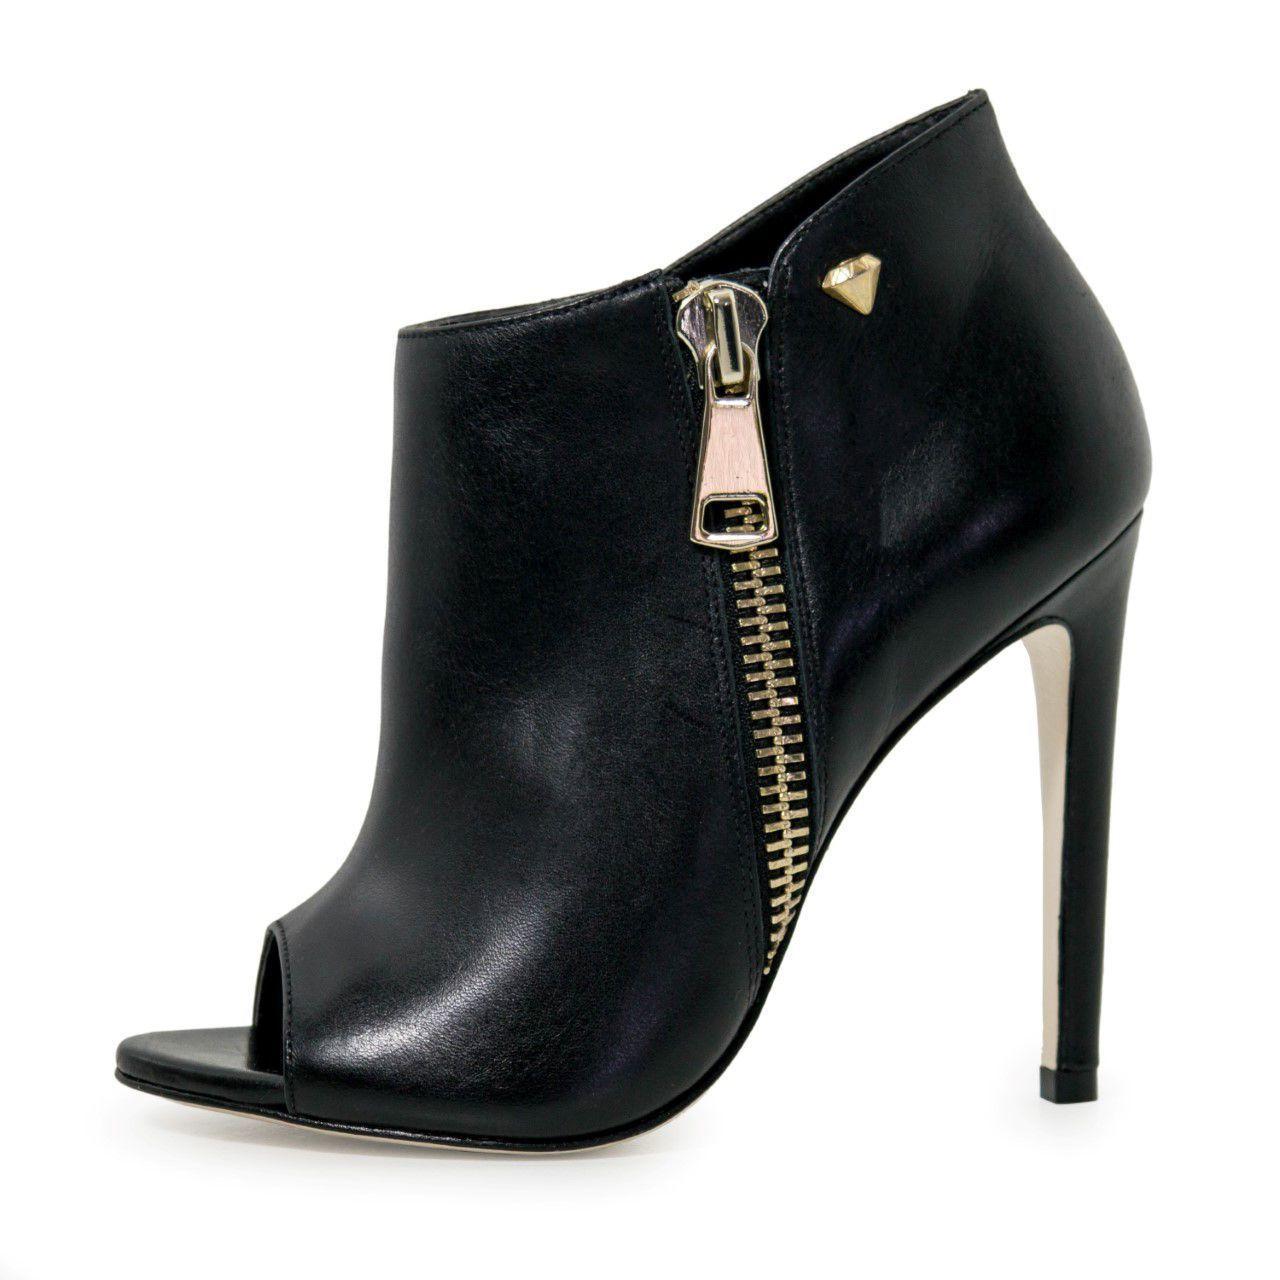 Bota Open Boot Conceito Fashion Couro Napa Preto